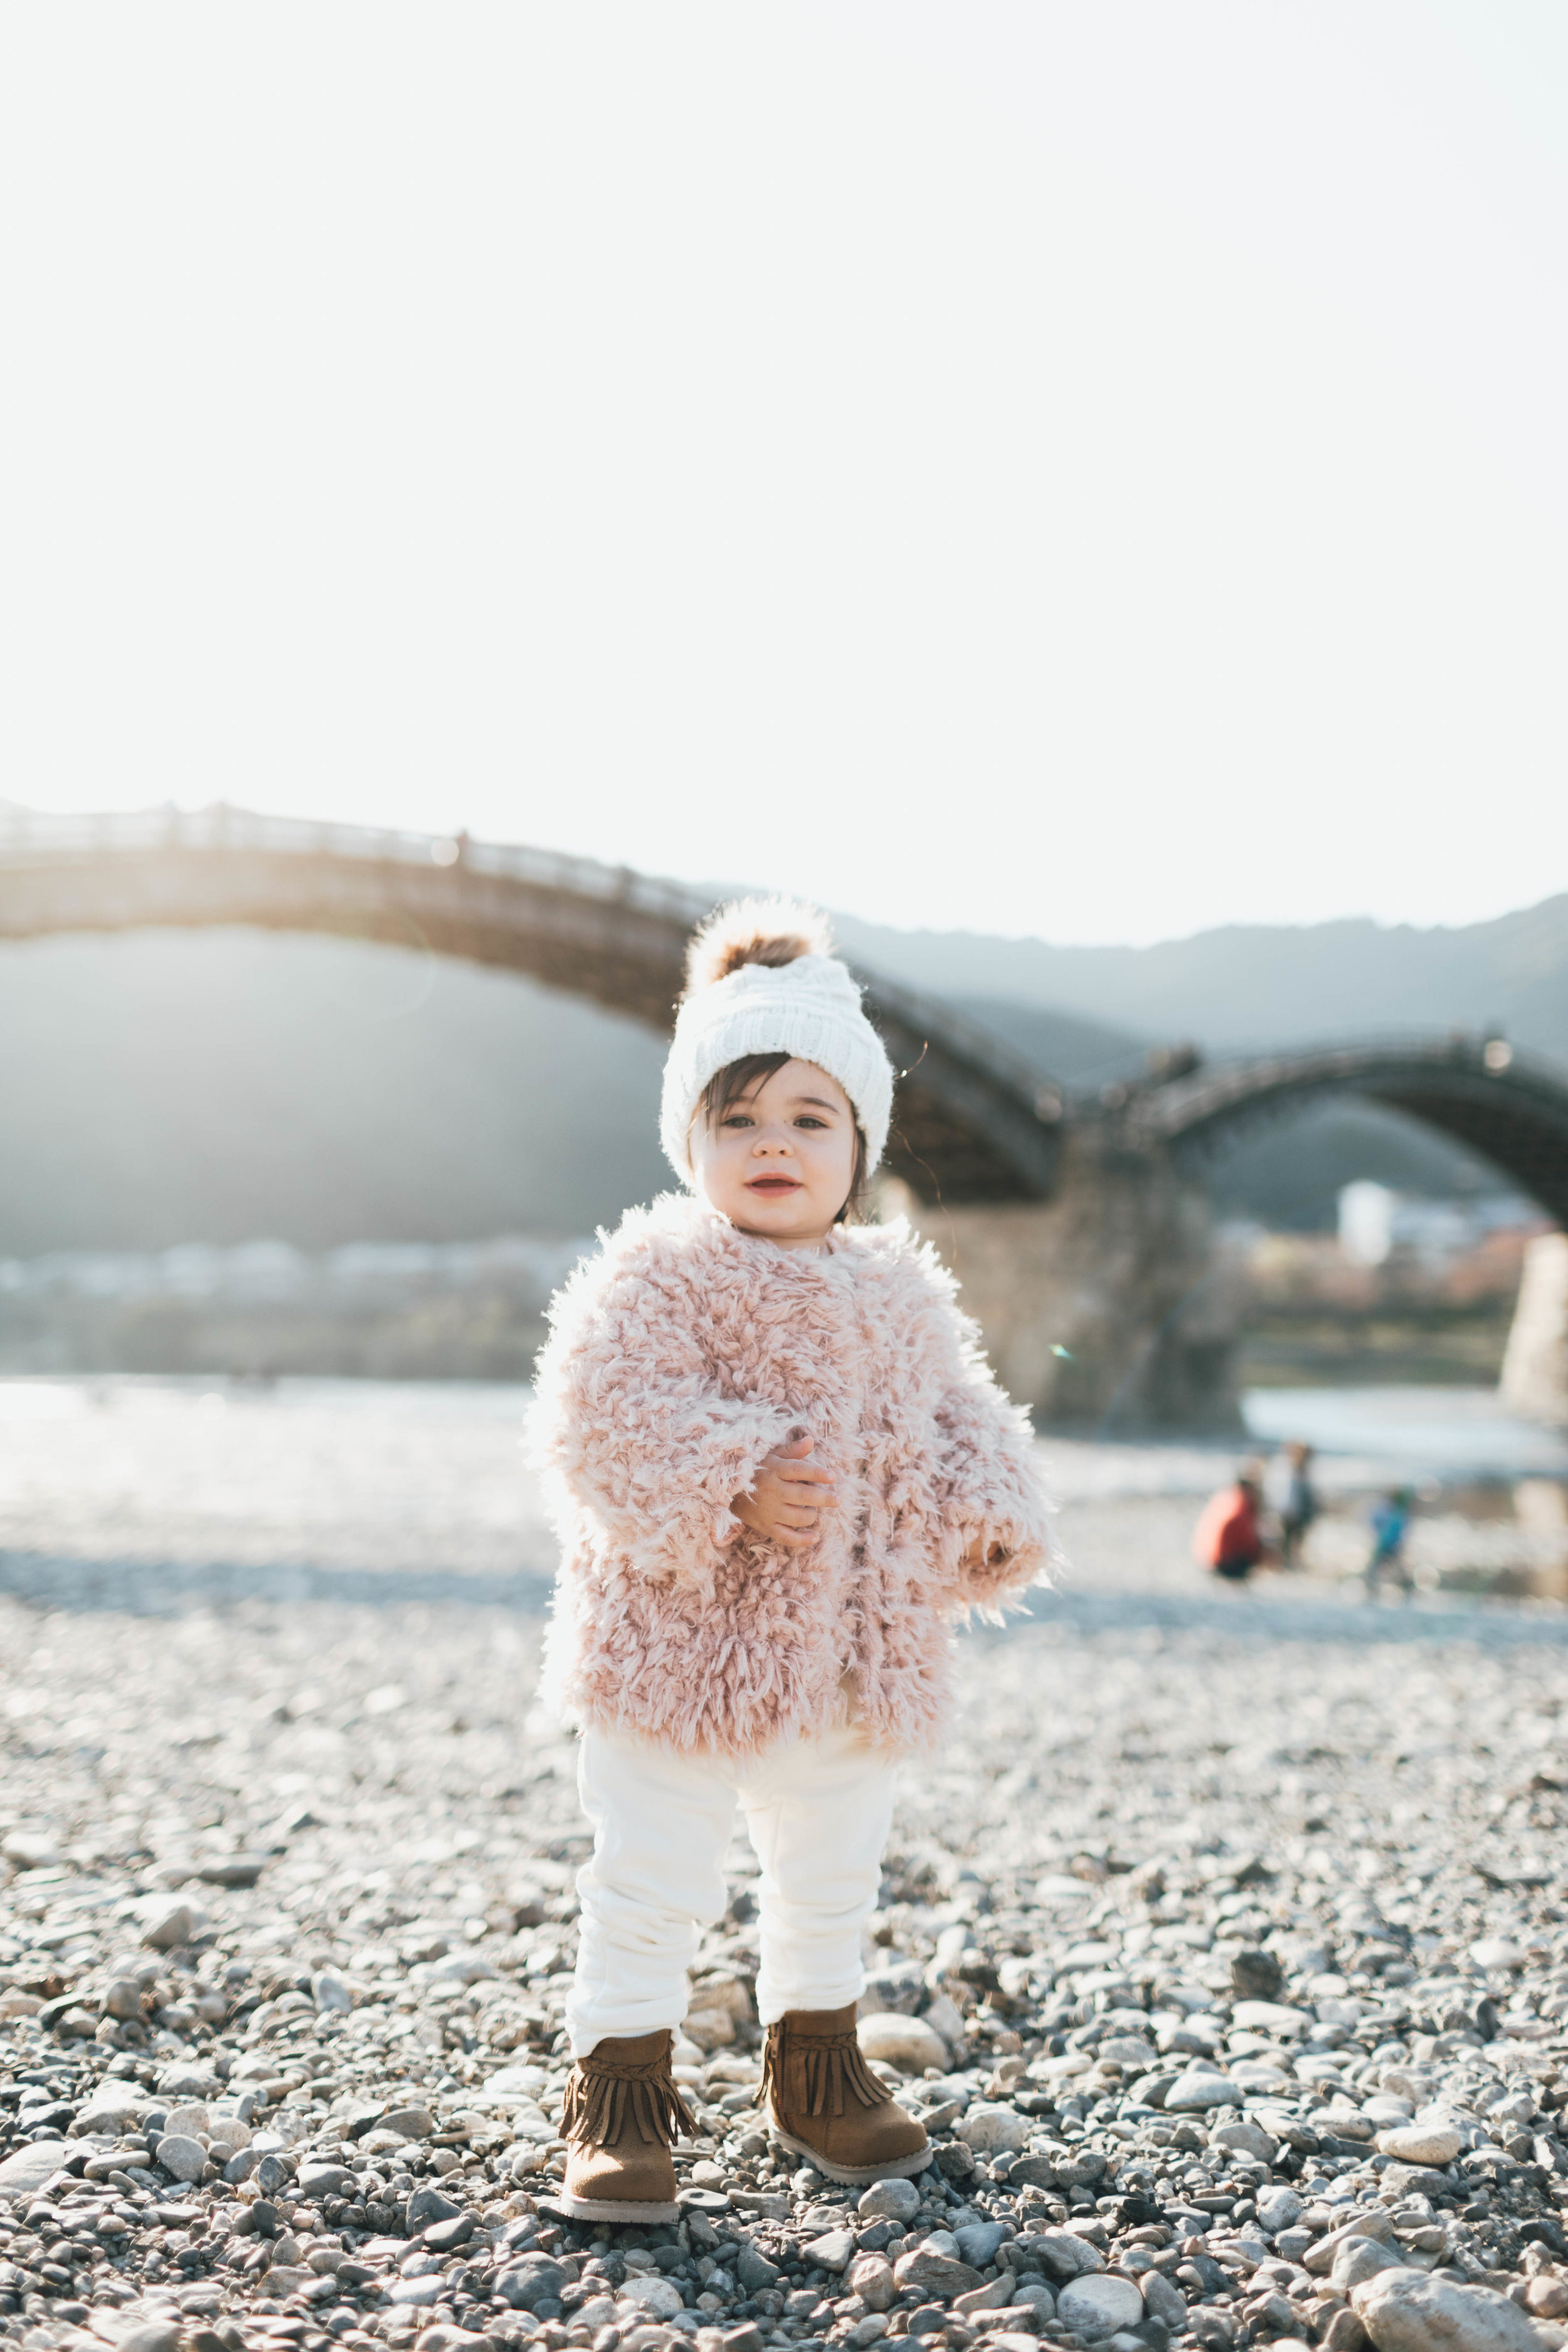 kintai-bridge-family-session-photo-by-samantha-look.jpg